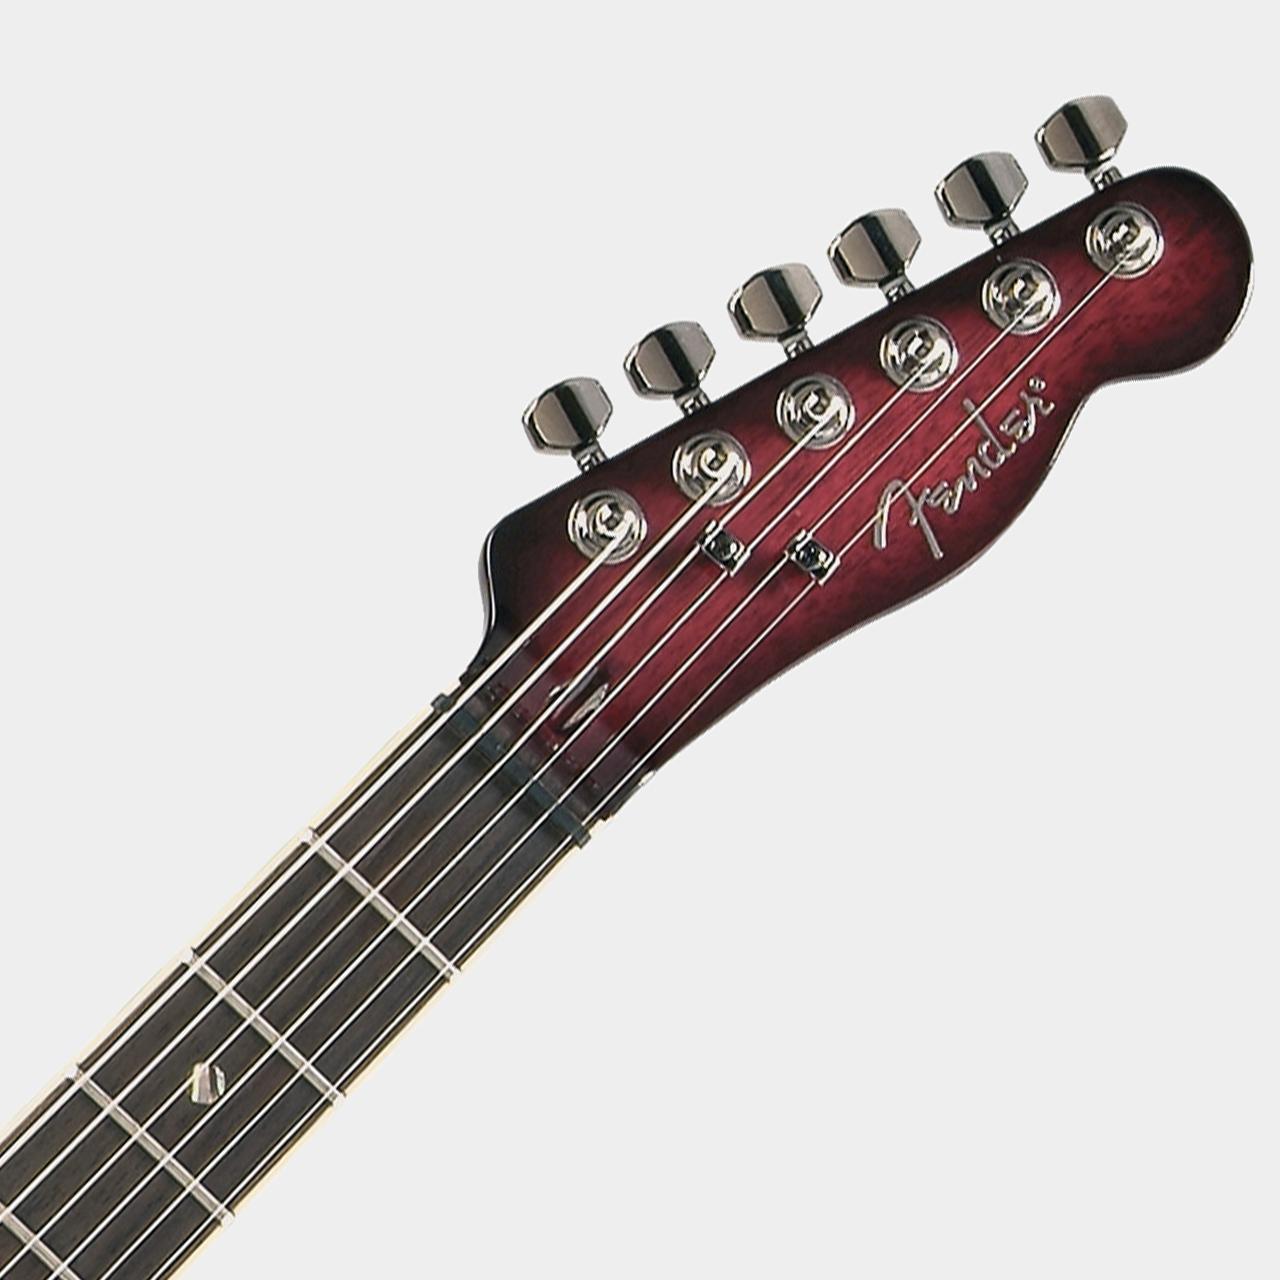 Fender Custom Telecaster Fmt Rw Bcb Black Cherry Sunburst